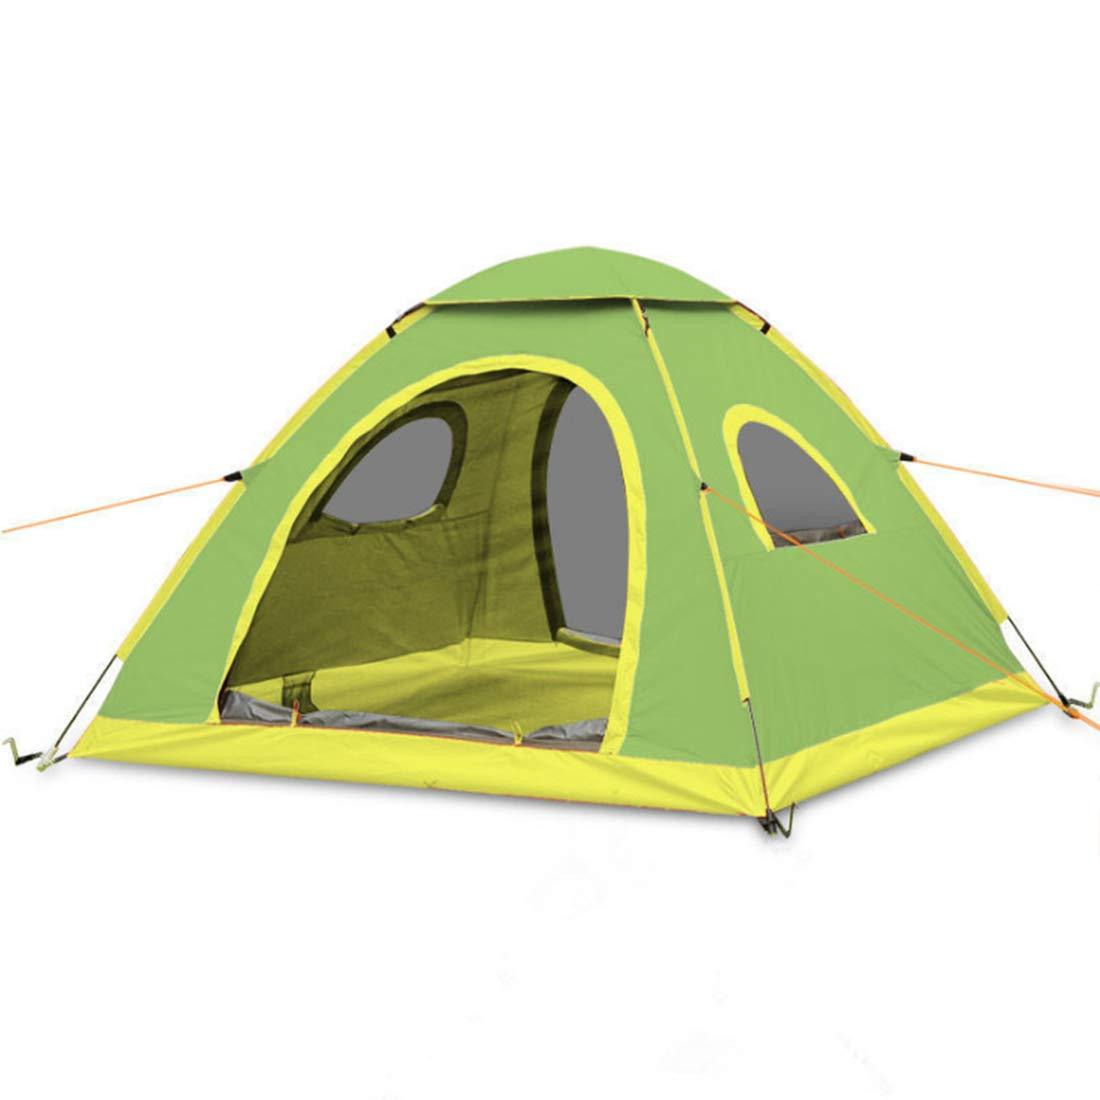 MINGANGSAYONE Outdoor Camping für 4 Personen oder 3 Personen Wasserdichtes Zelt